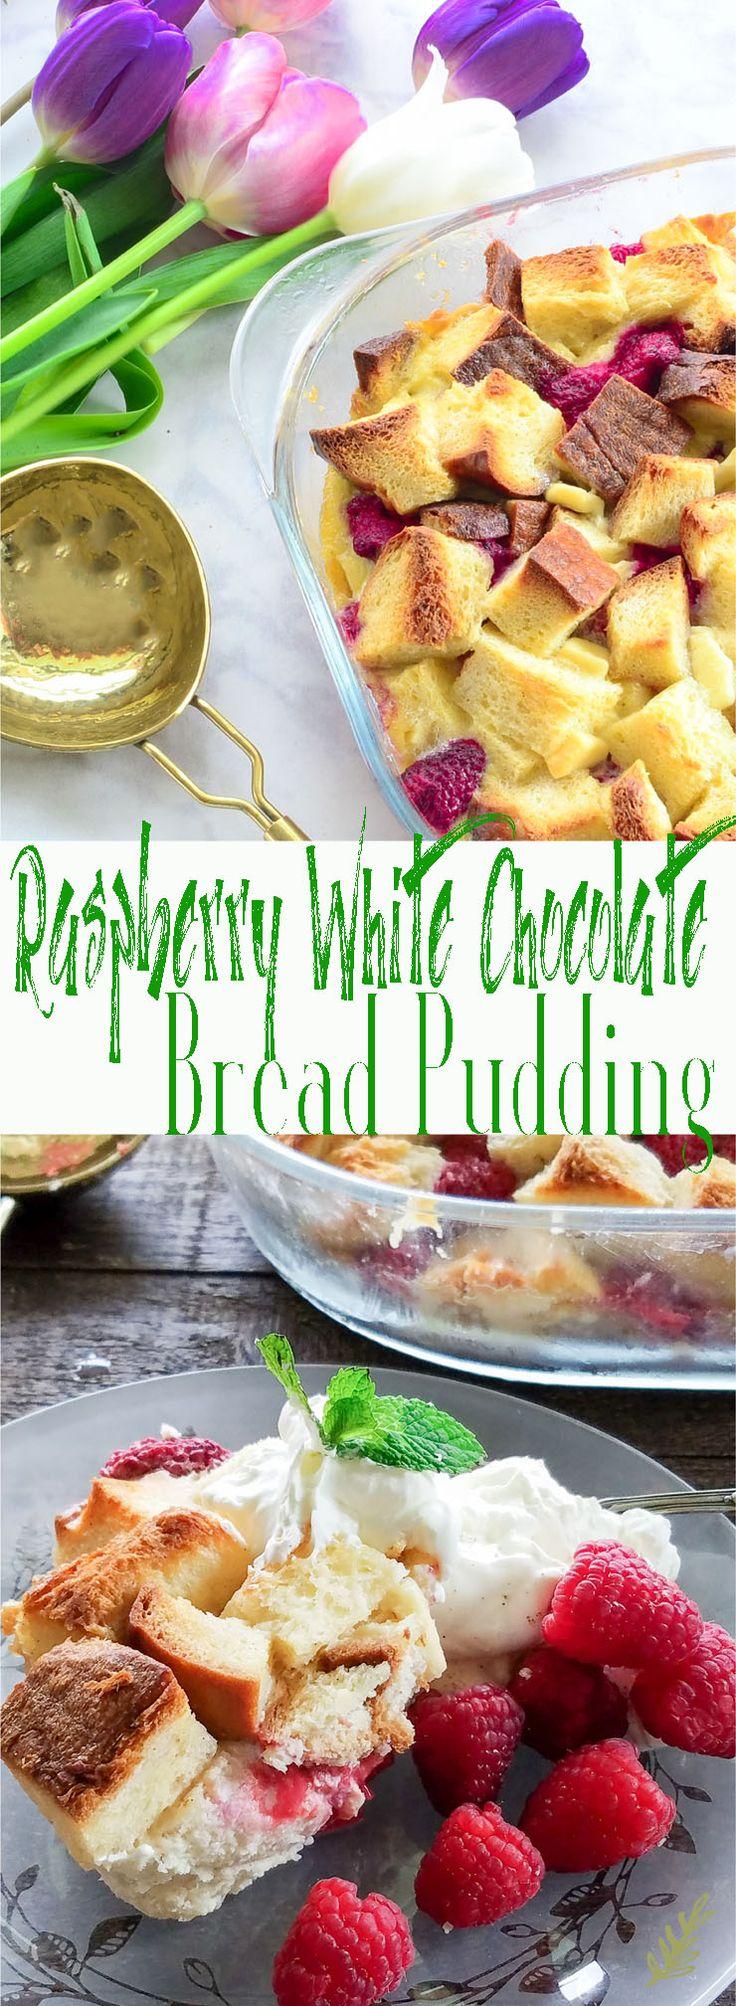 Raspberry White Chocolate Bread Pudding